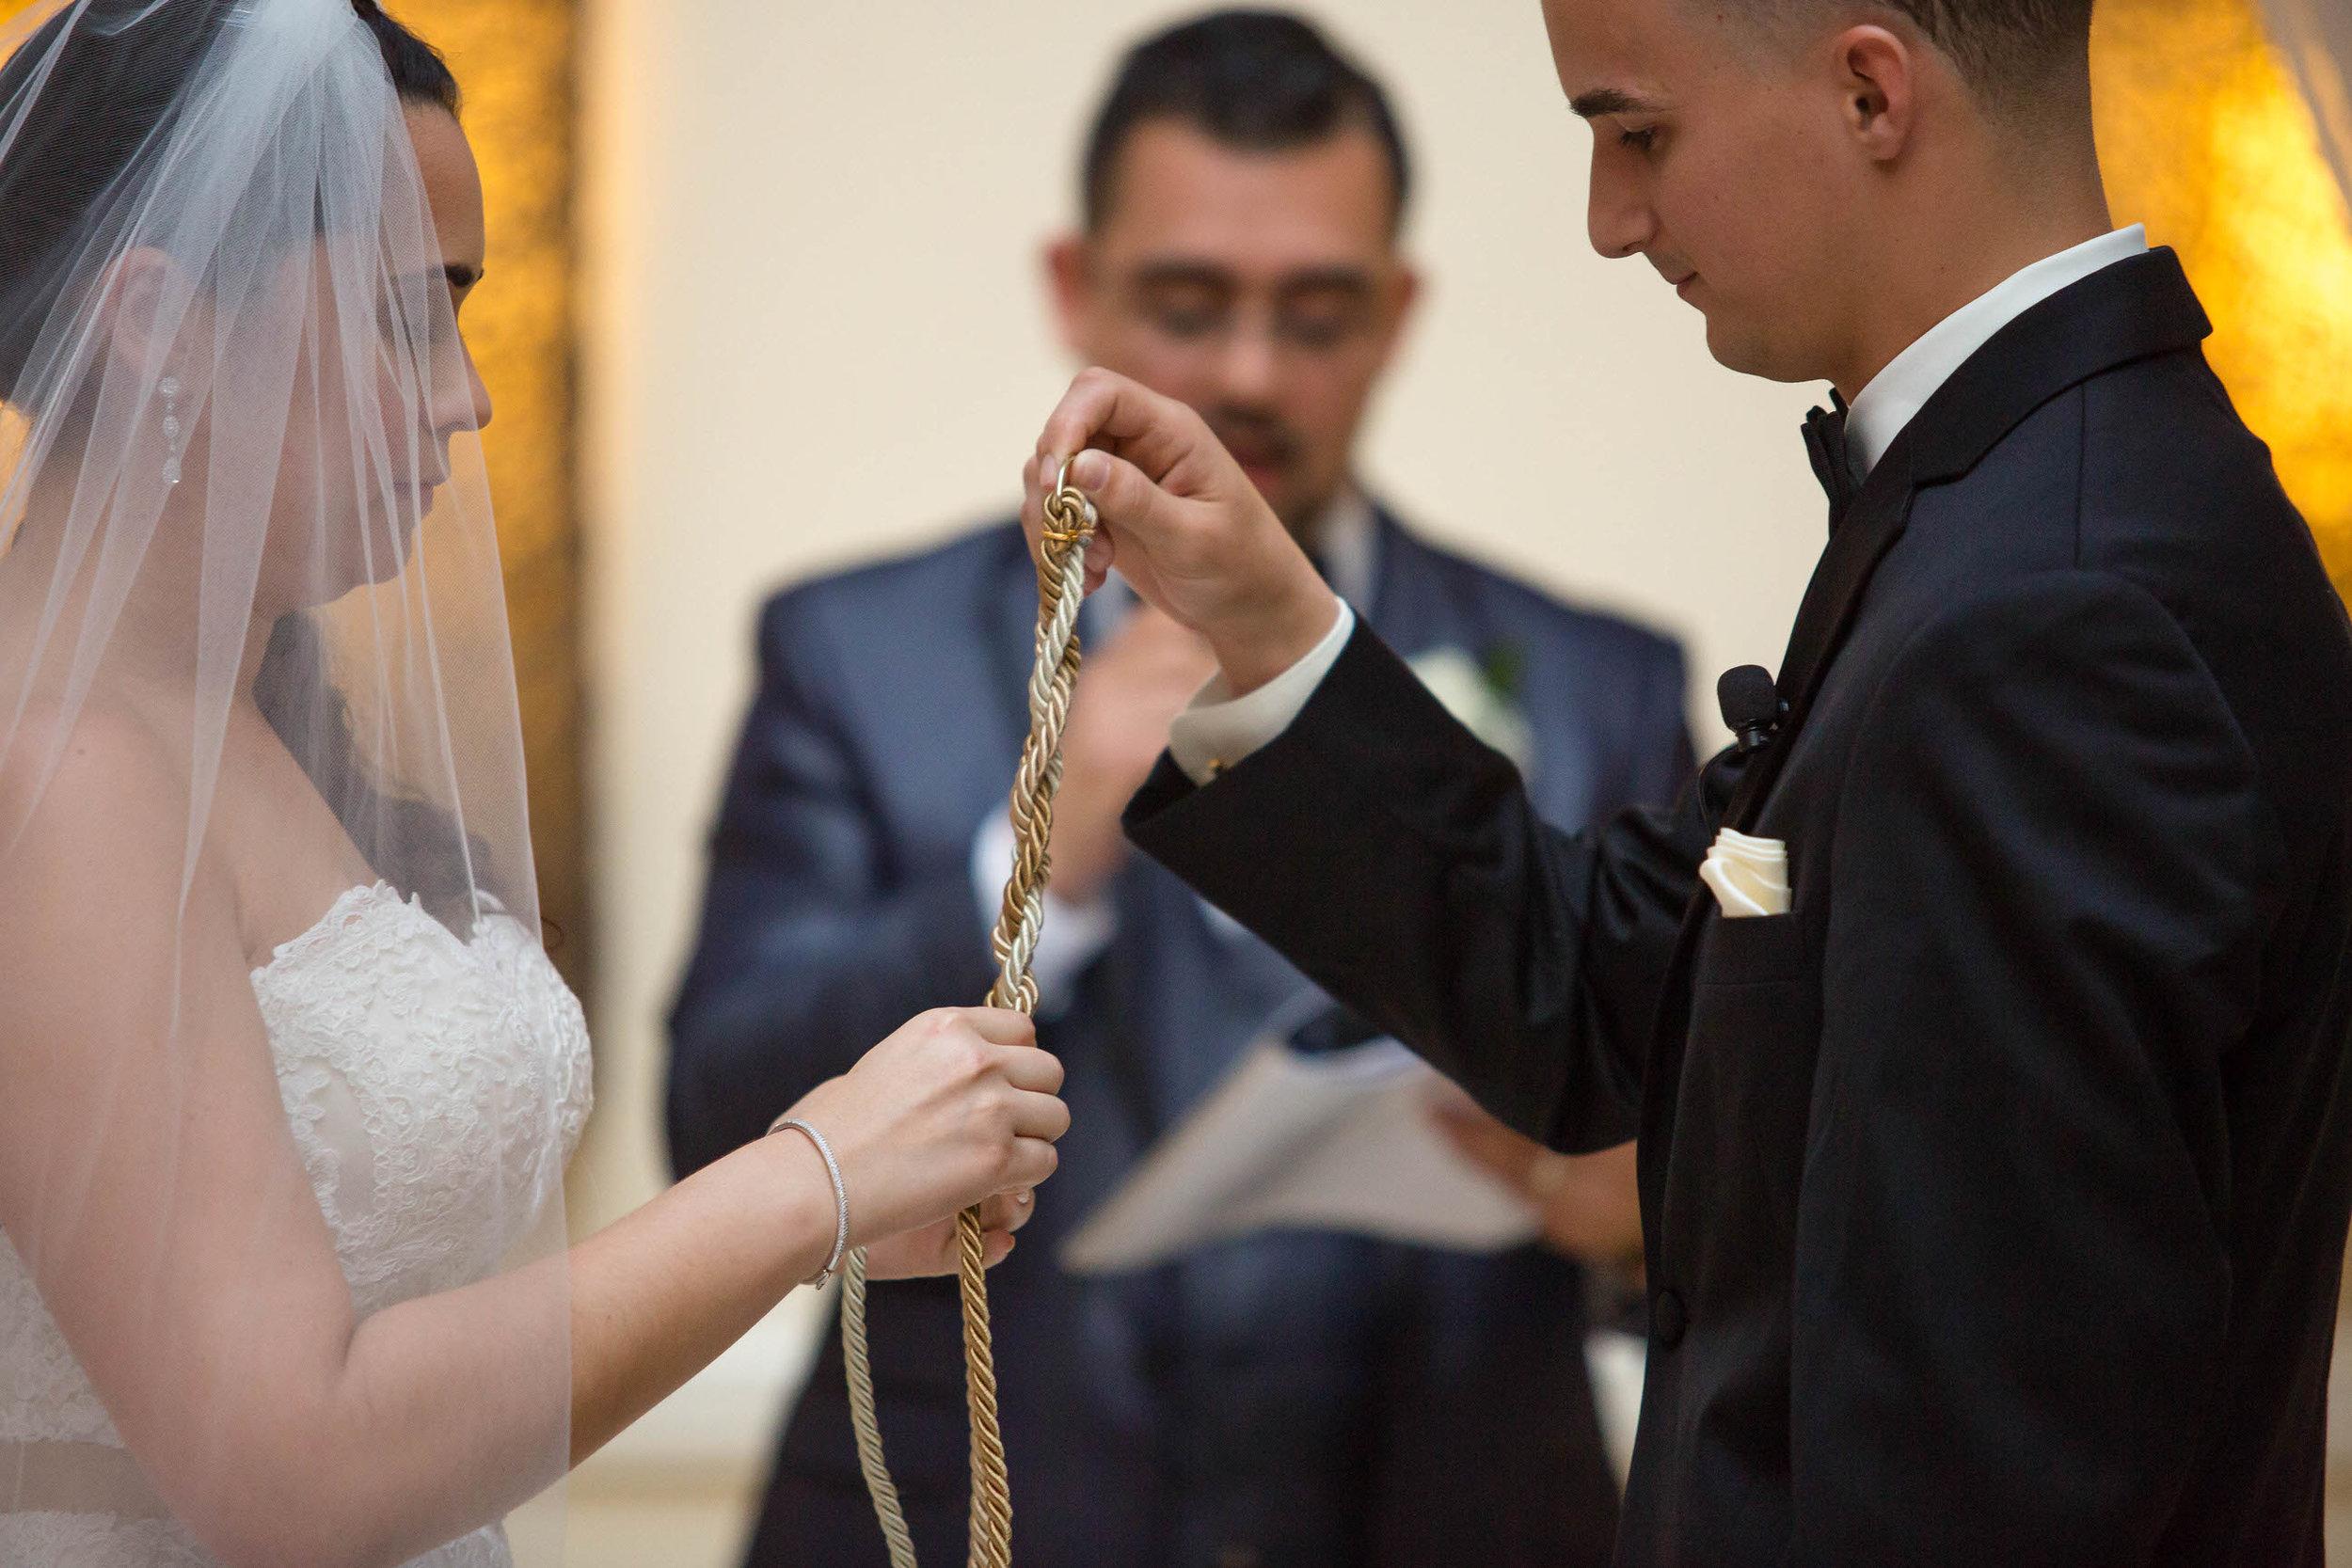 tie-the-knot-mayfair-professional-wedding-photographer-tiny-house-photo.jpg